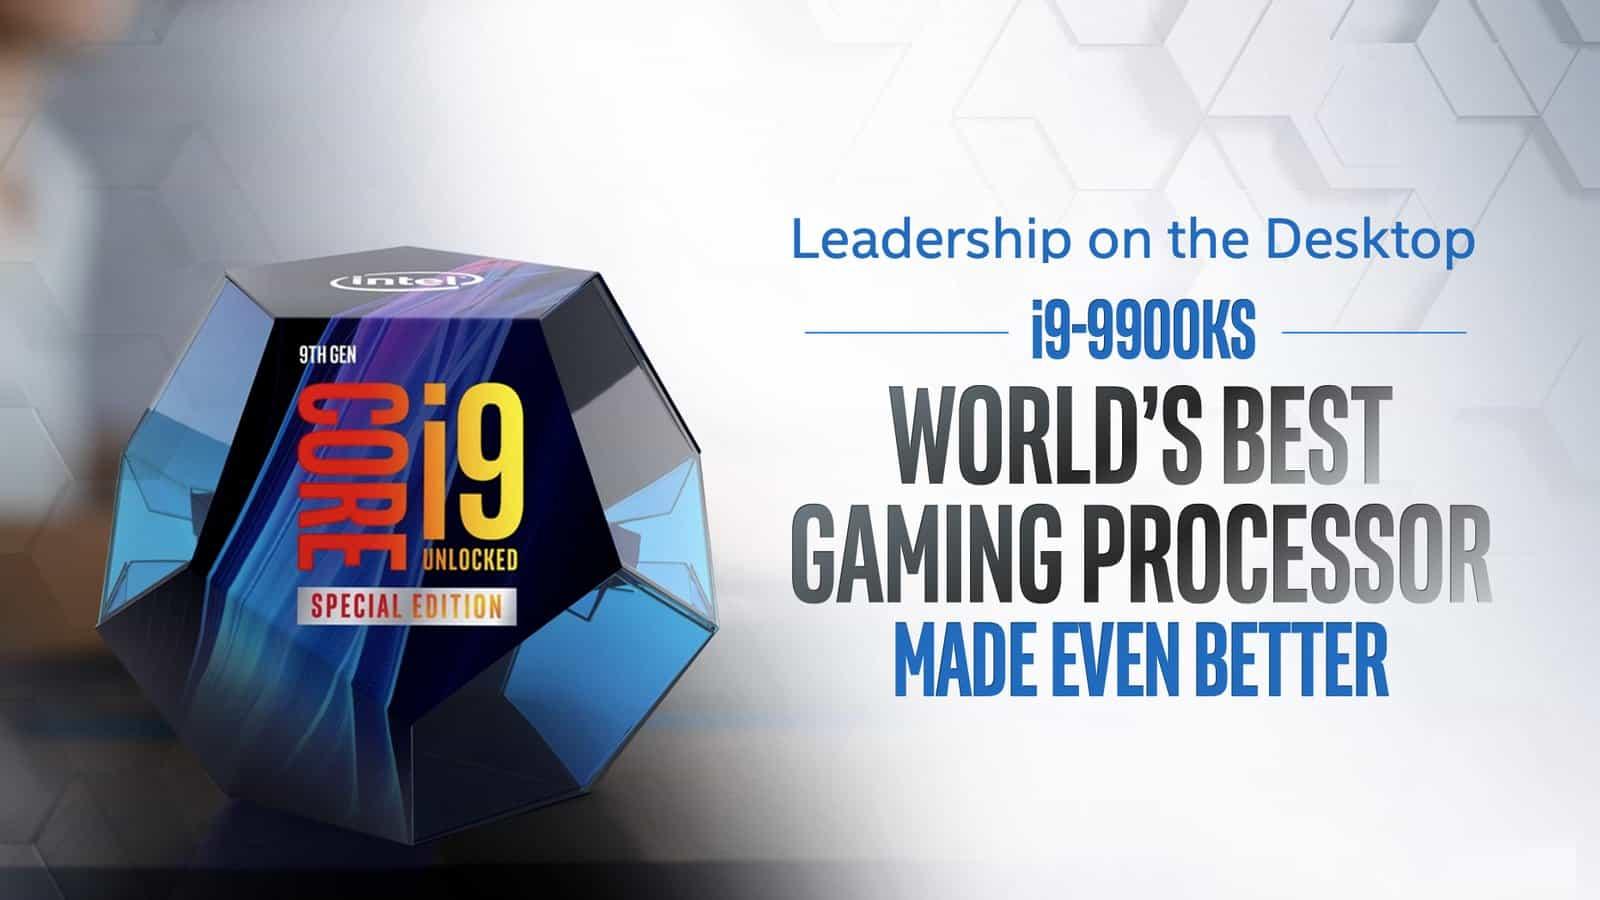 Procesor Intel Core i9-9900KS Special Edition